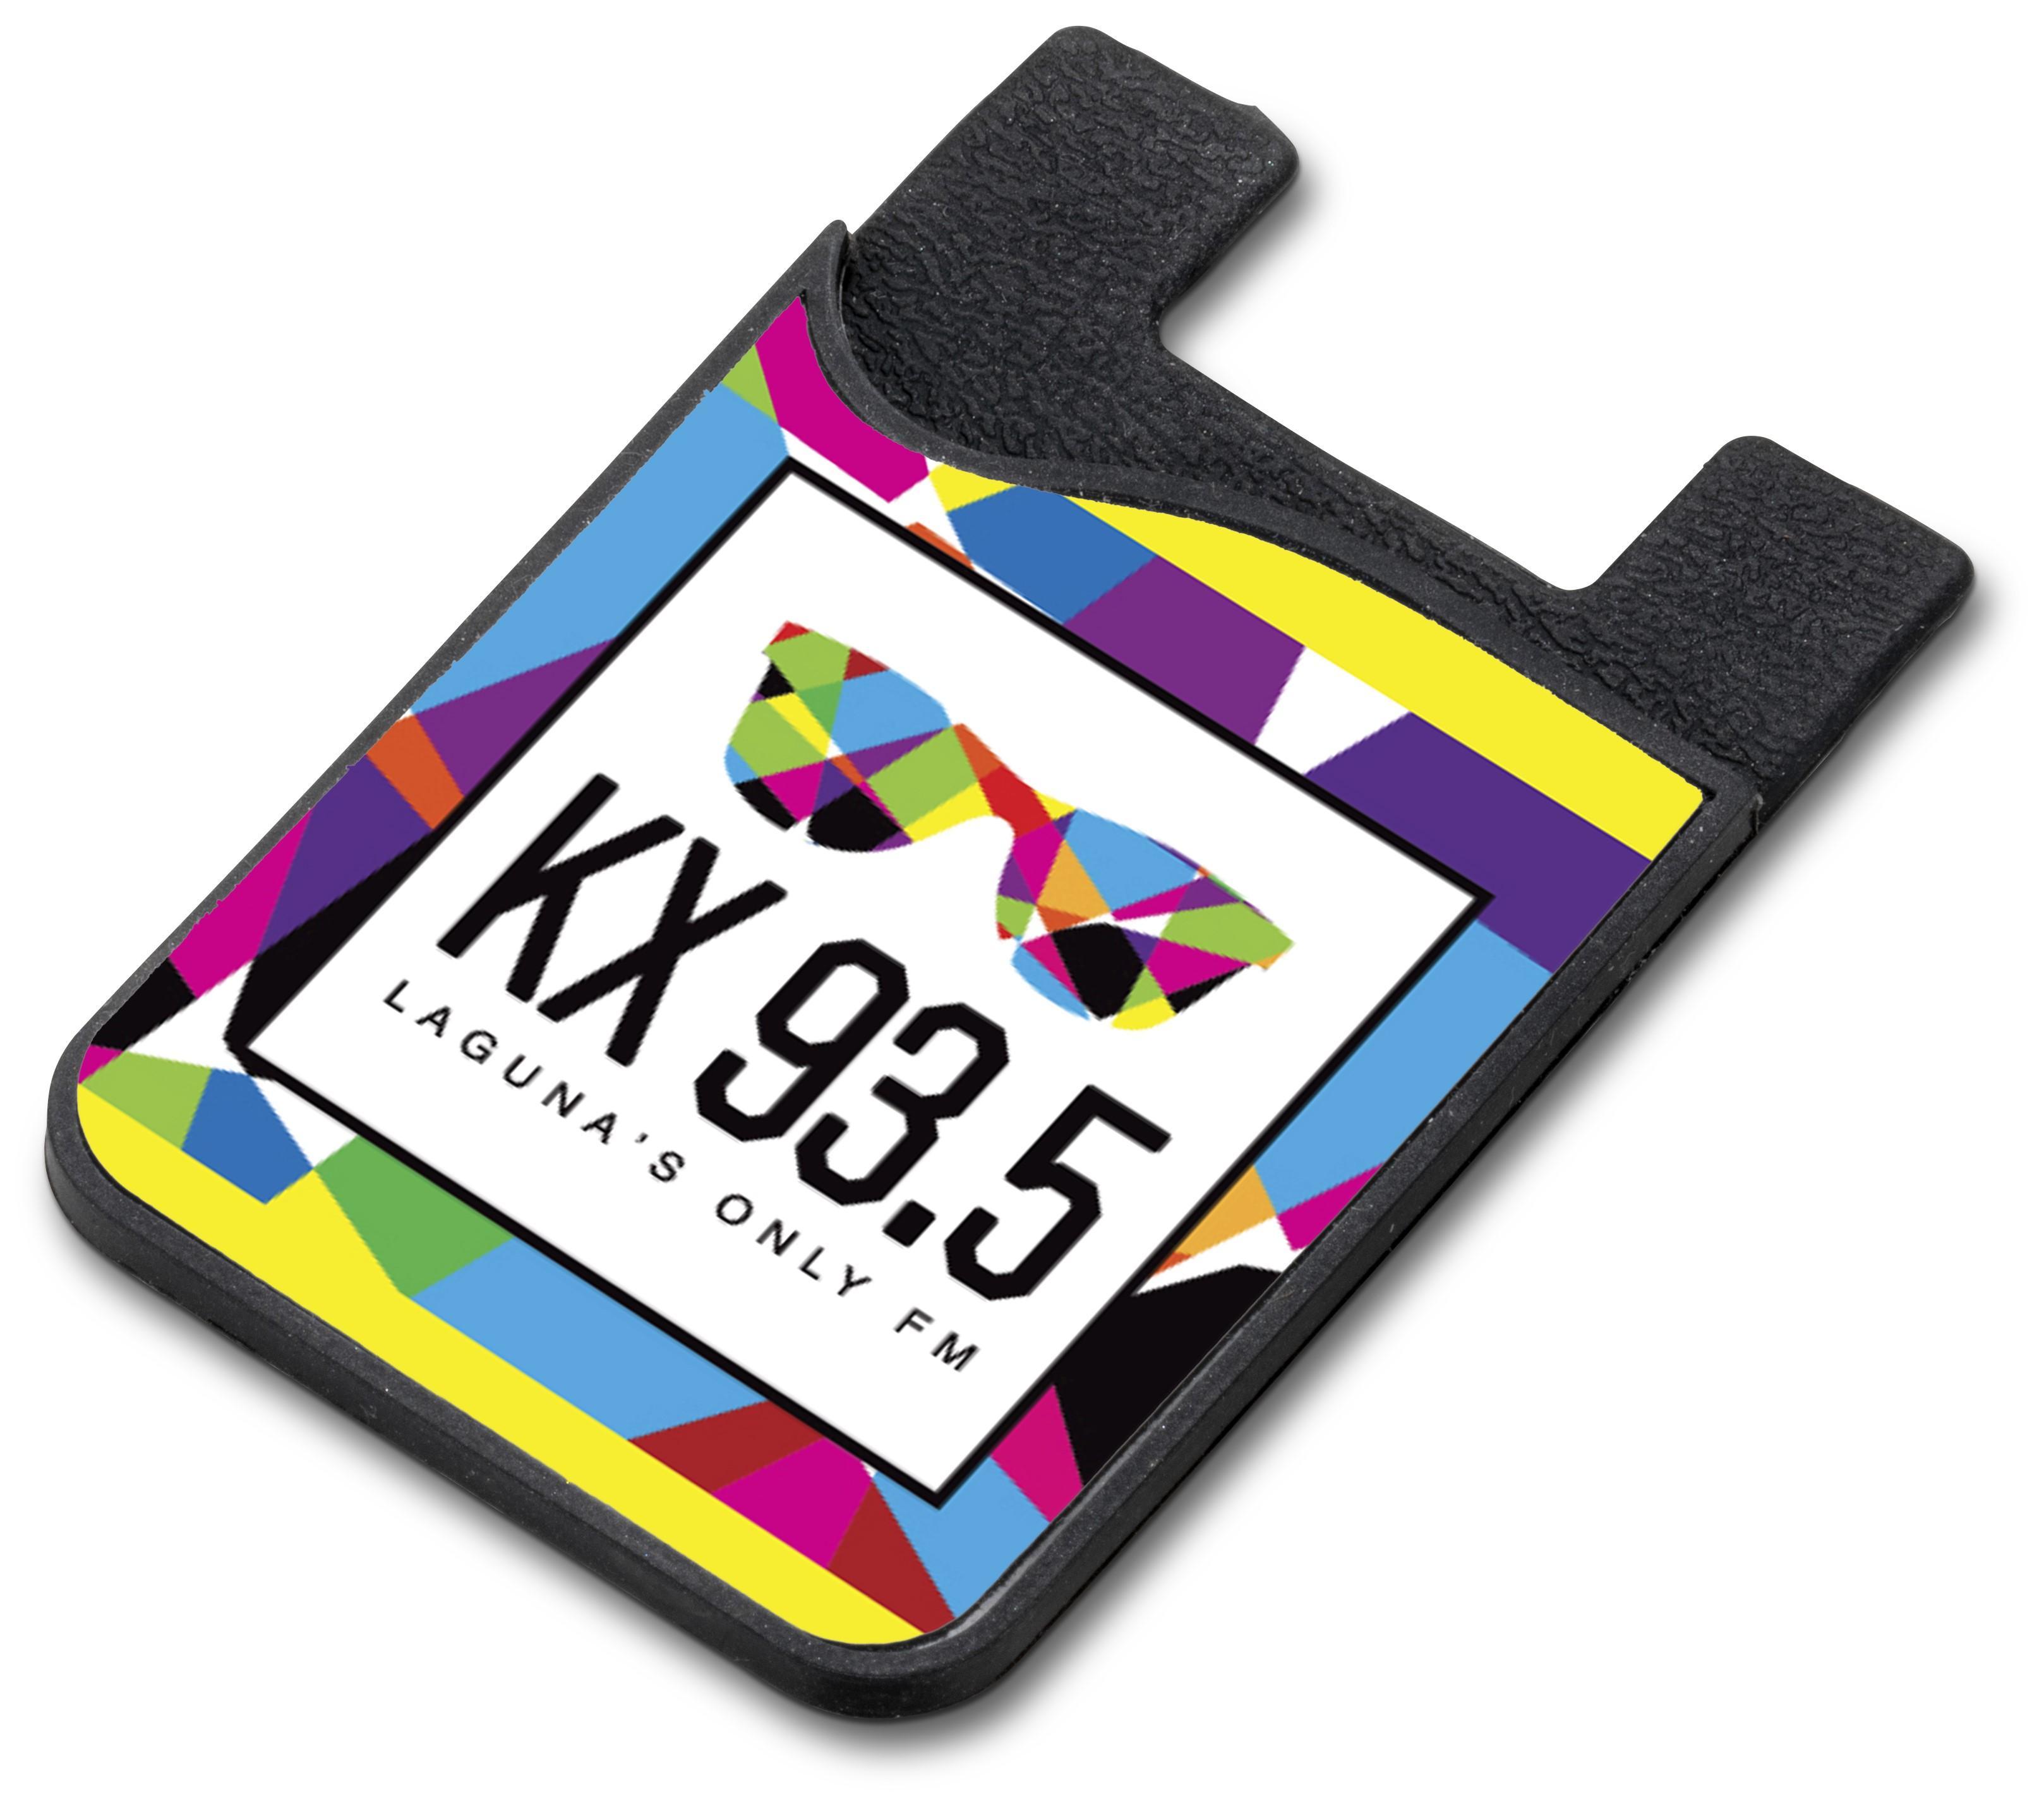 Arcade Phone Card Holder